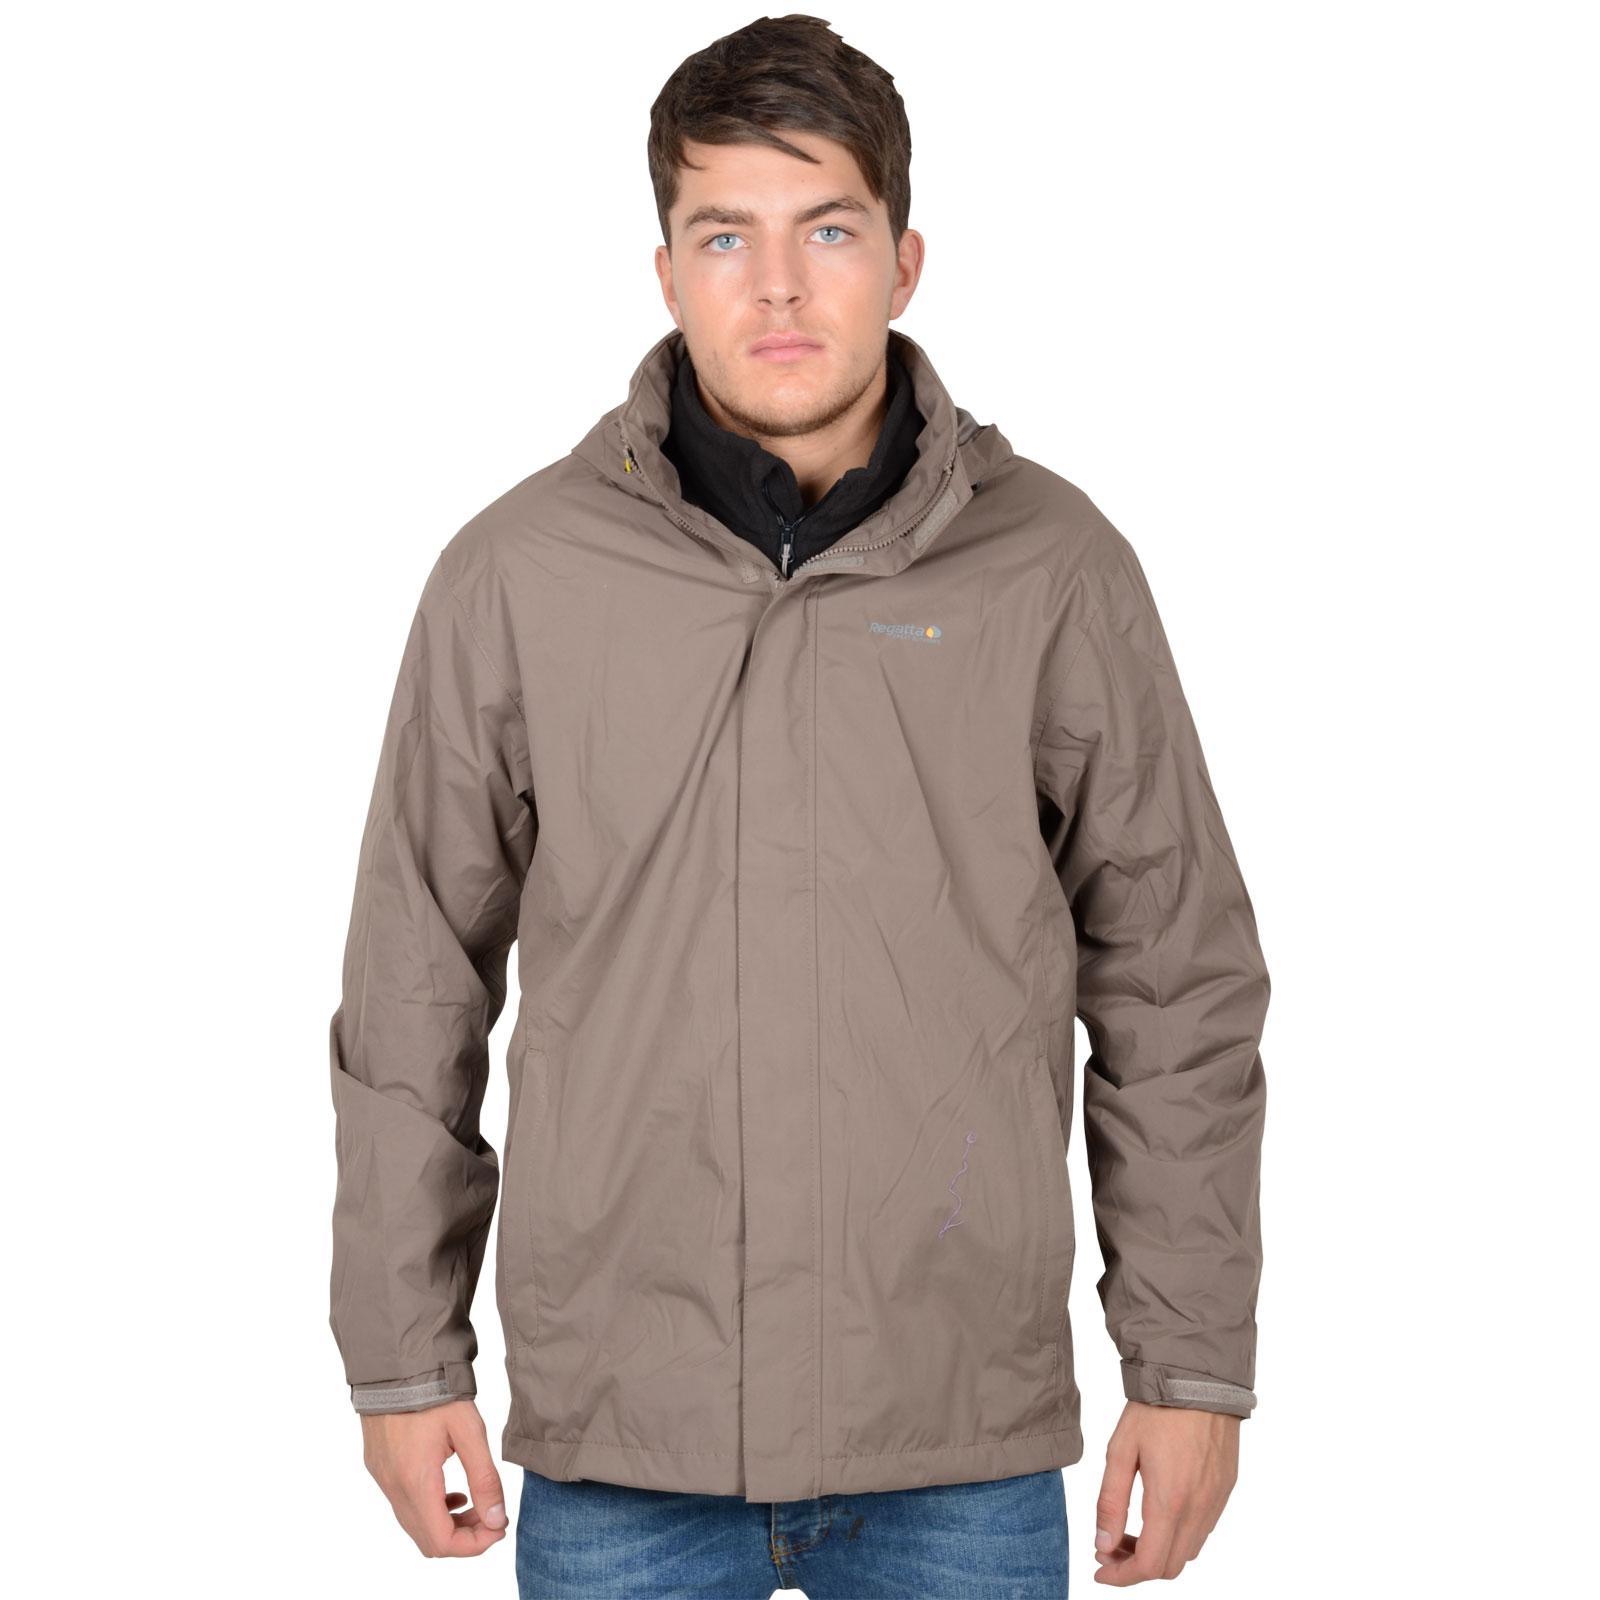 Mens regatta jacket - Mens Regatta Matthews Waterproof Outdoor Jacket Rain Coat